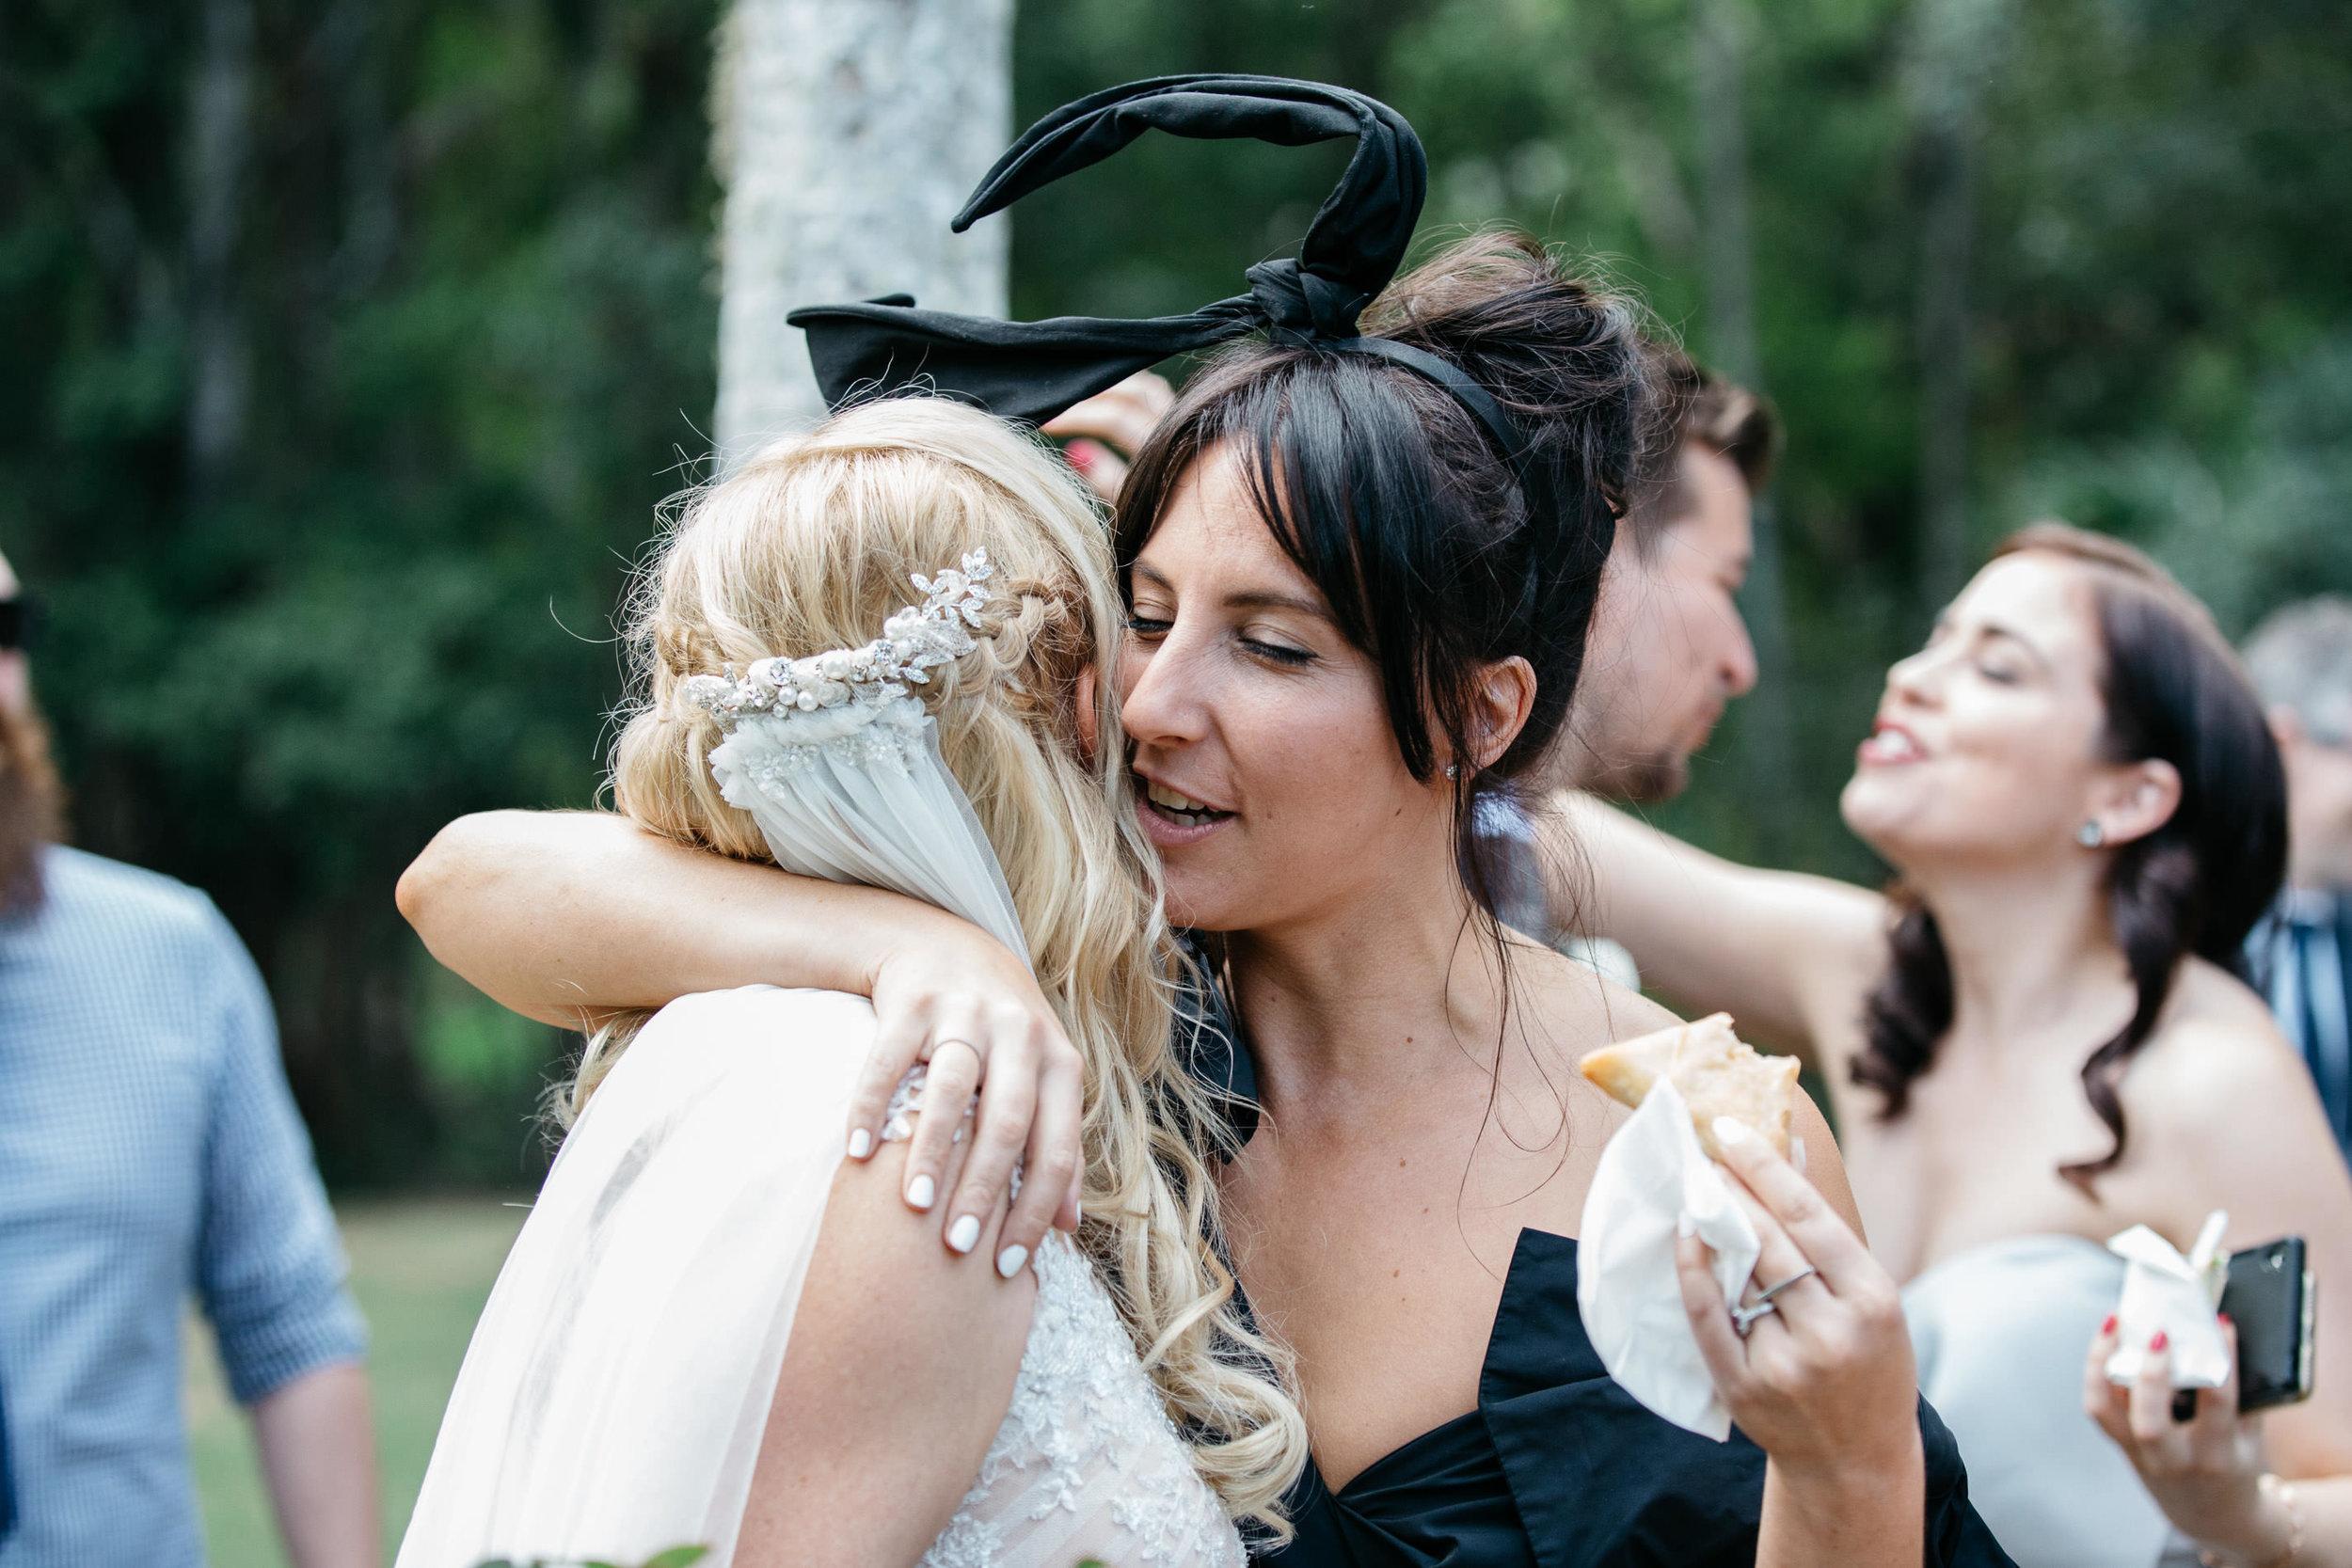 True North Photography_Boomerang Farm_Stacey and Isaac_Gold Coast Wedding_Barm Wedding_Hinterland Wedding-119.jpg